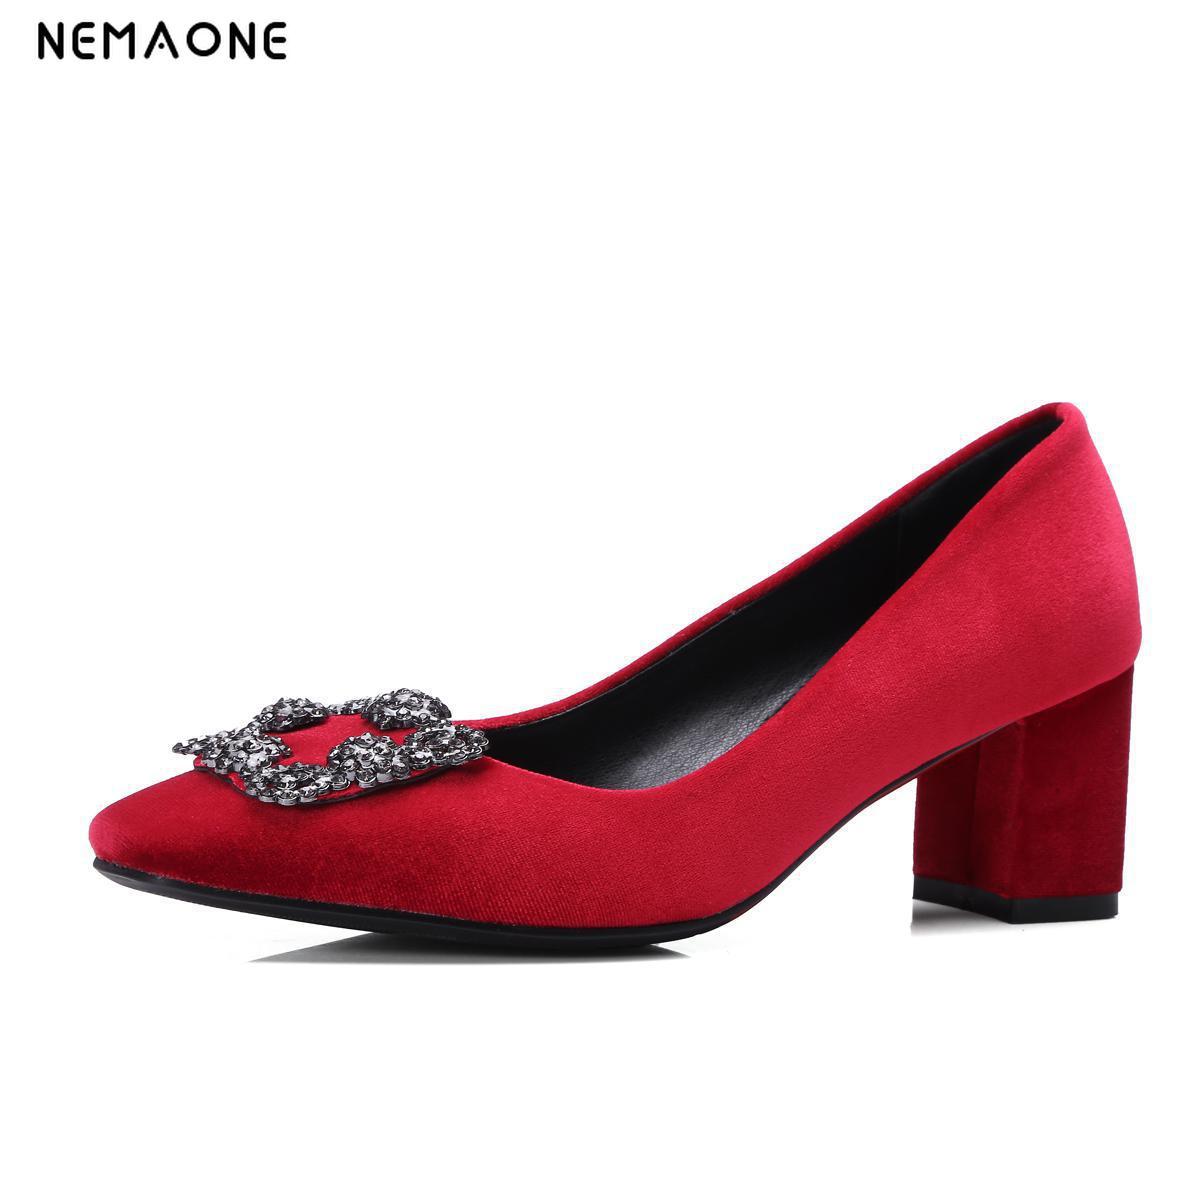 NEMAONE Plus size 34-43 2017 new high quality high heels elegant women pumps square heels party wedding shoes woman<br>